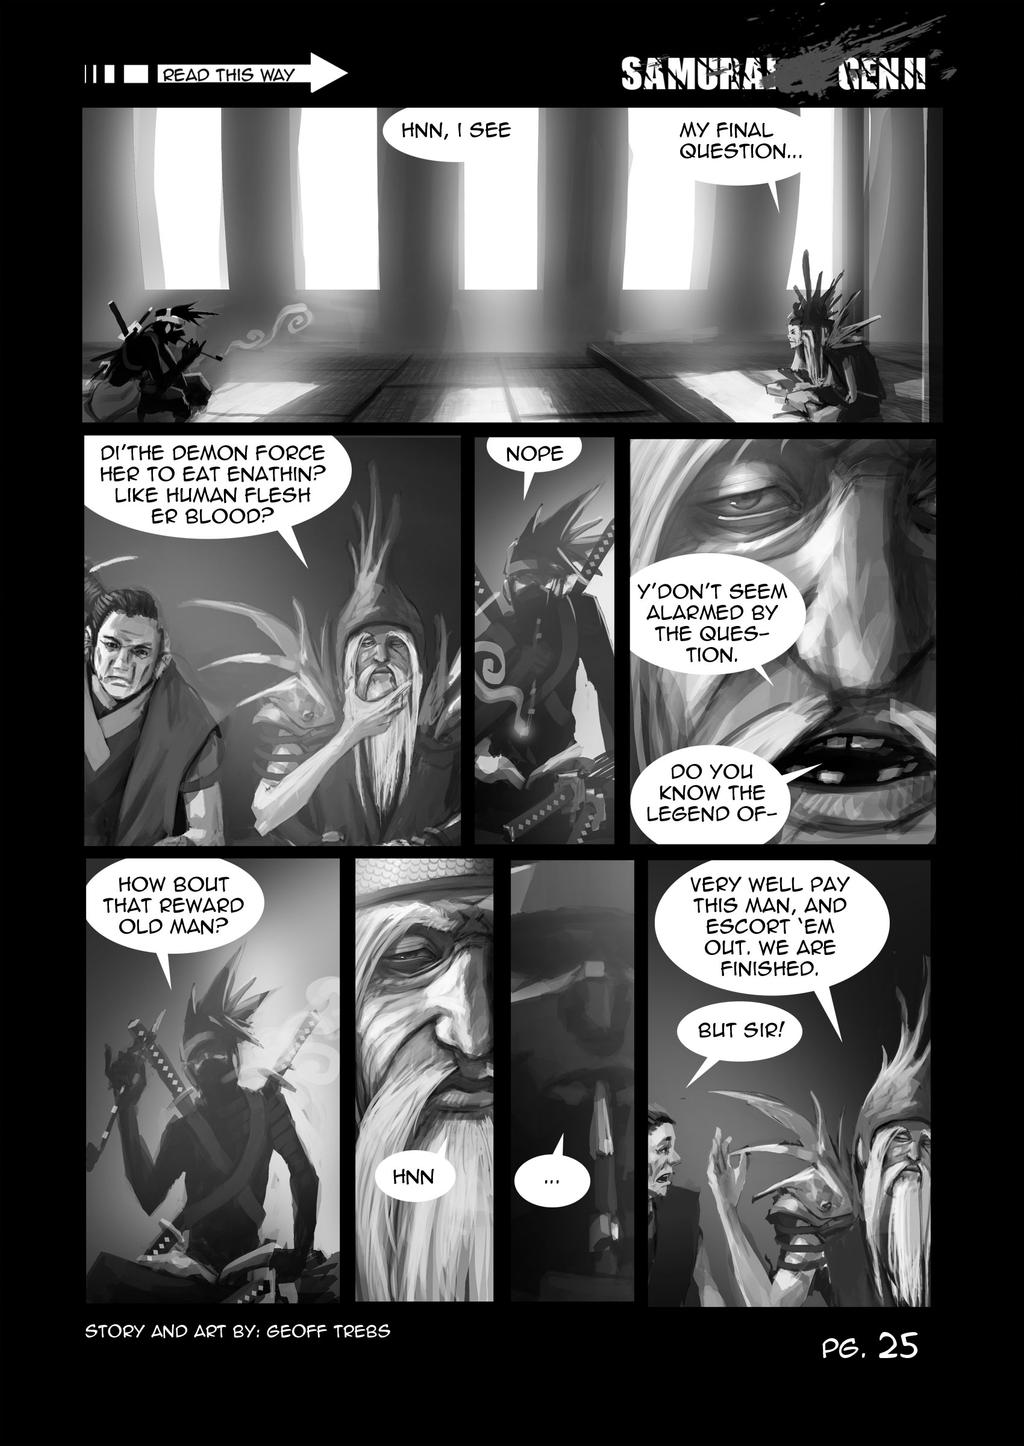 samurai genji pg.25 by dinmoney